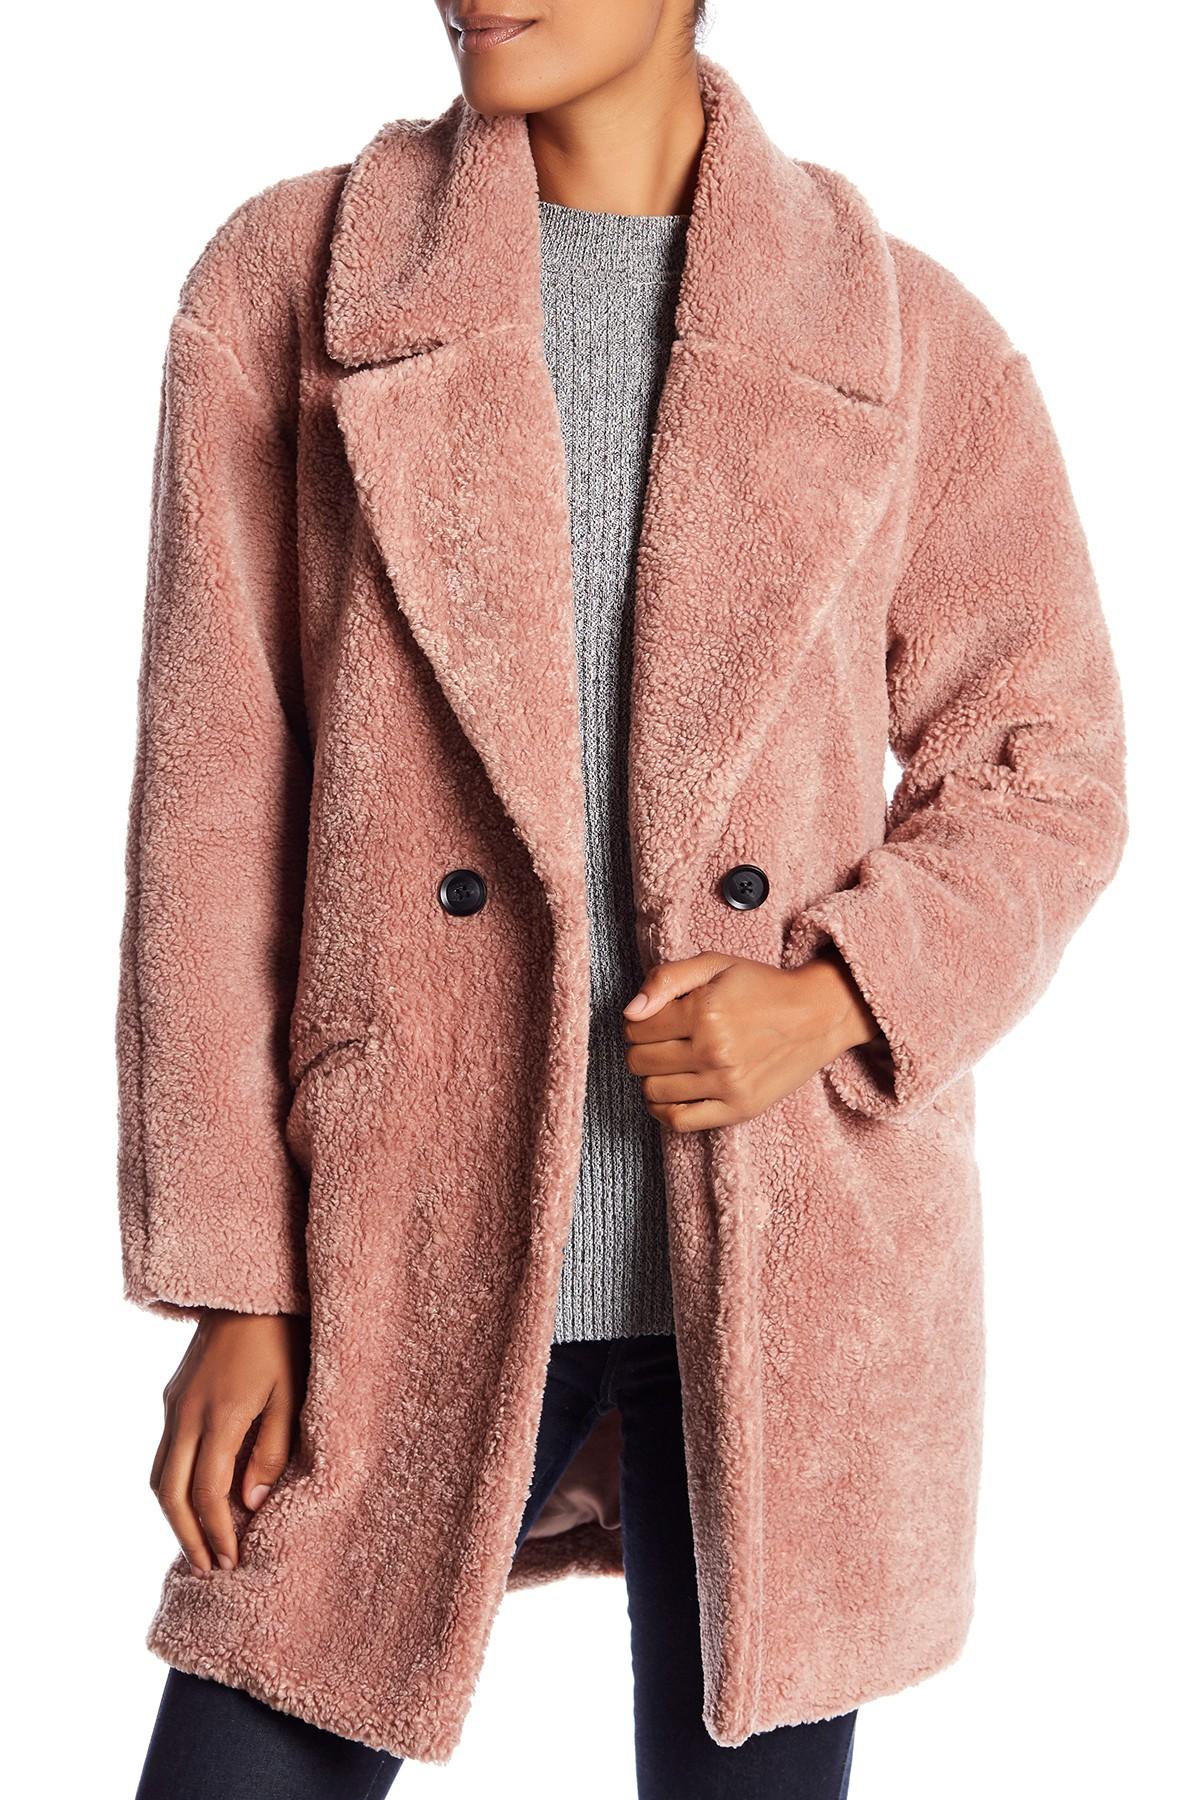 7a5319d6105 Image of Lucky Brand Missy Teddy Bear Faux Fur Jacket